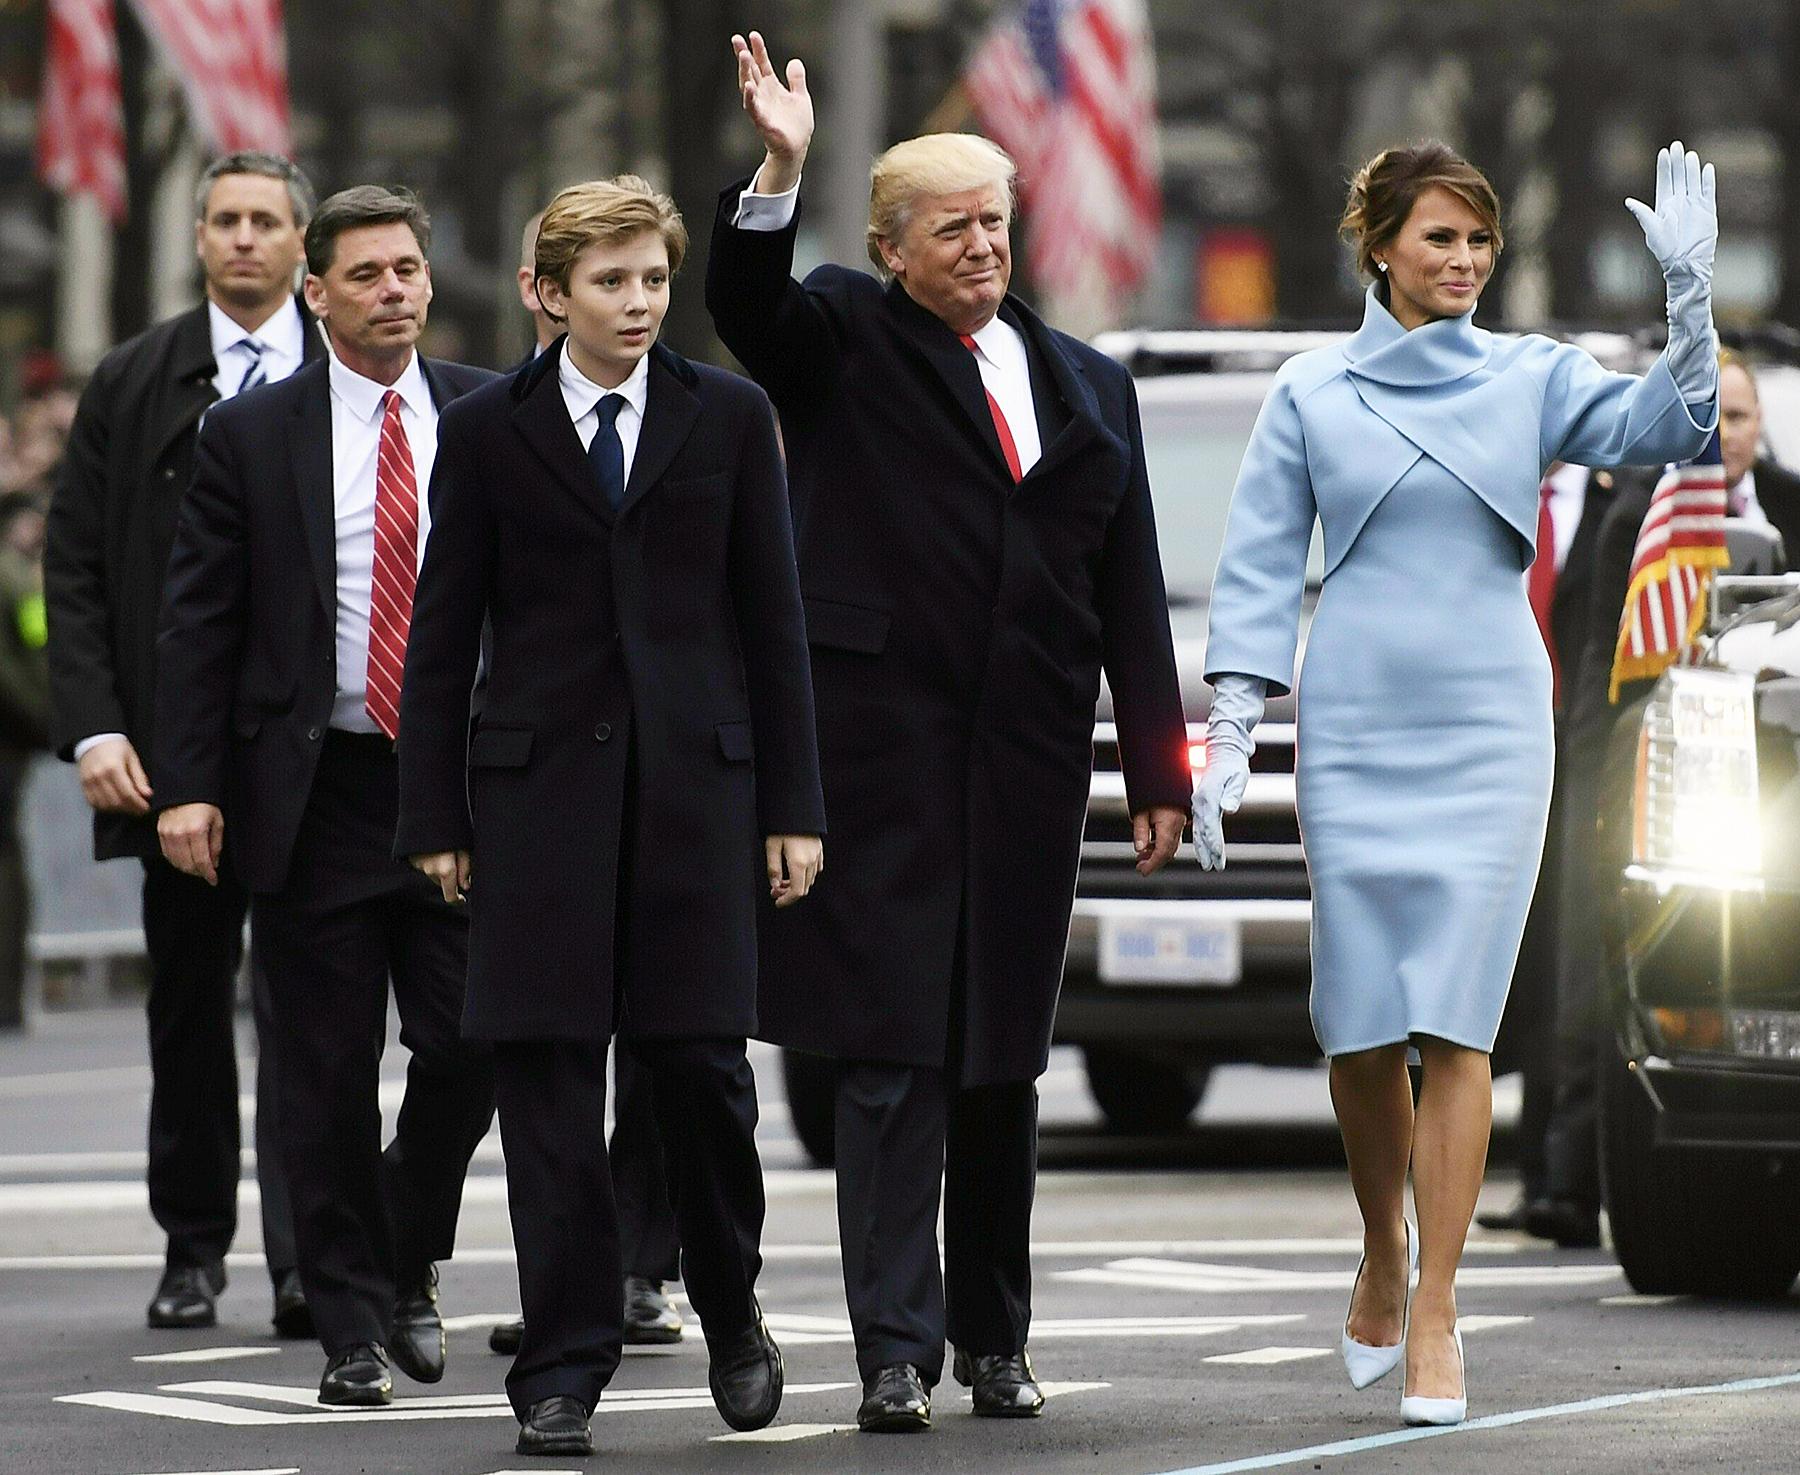 Barron Trump Donald Trump Melania Trump inauguration parade